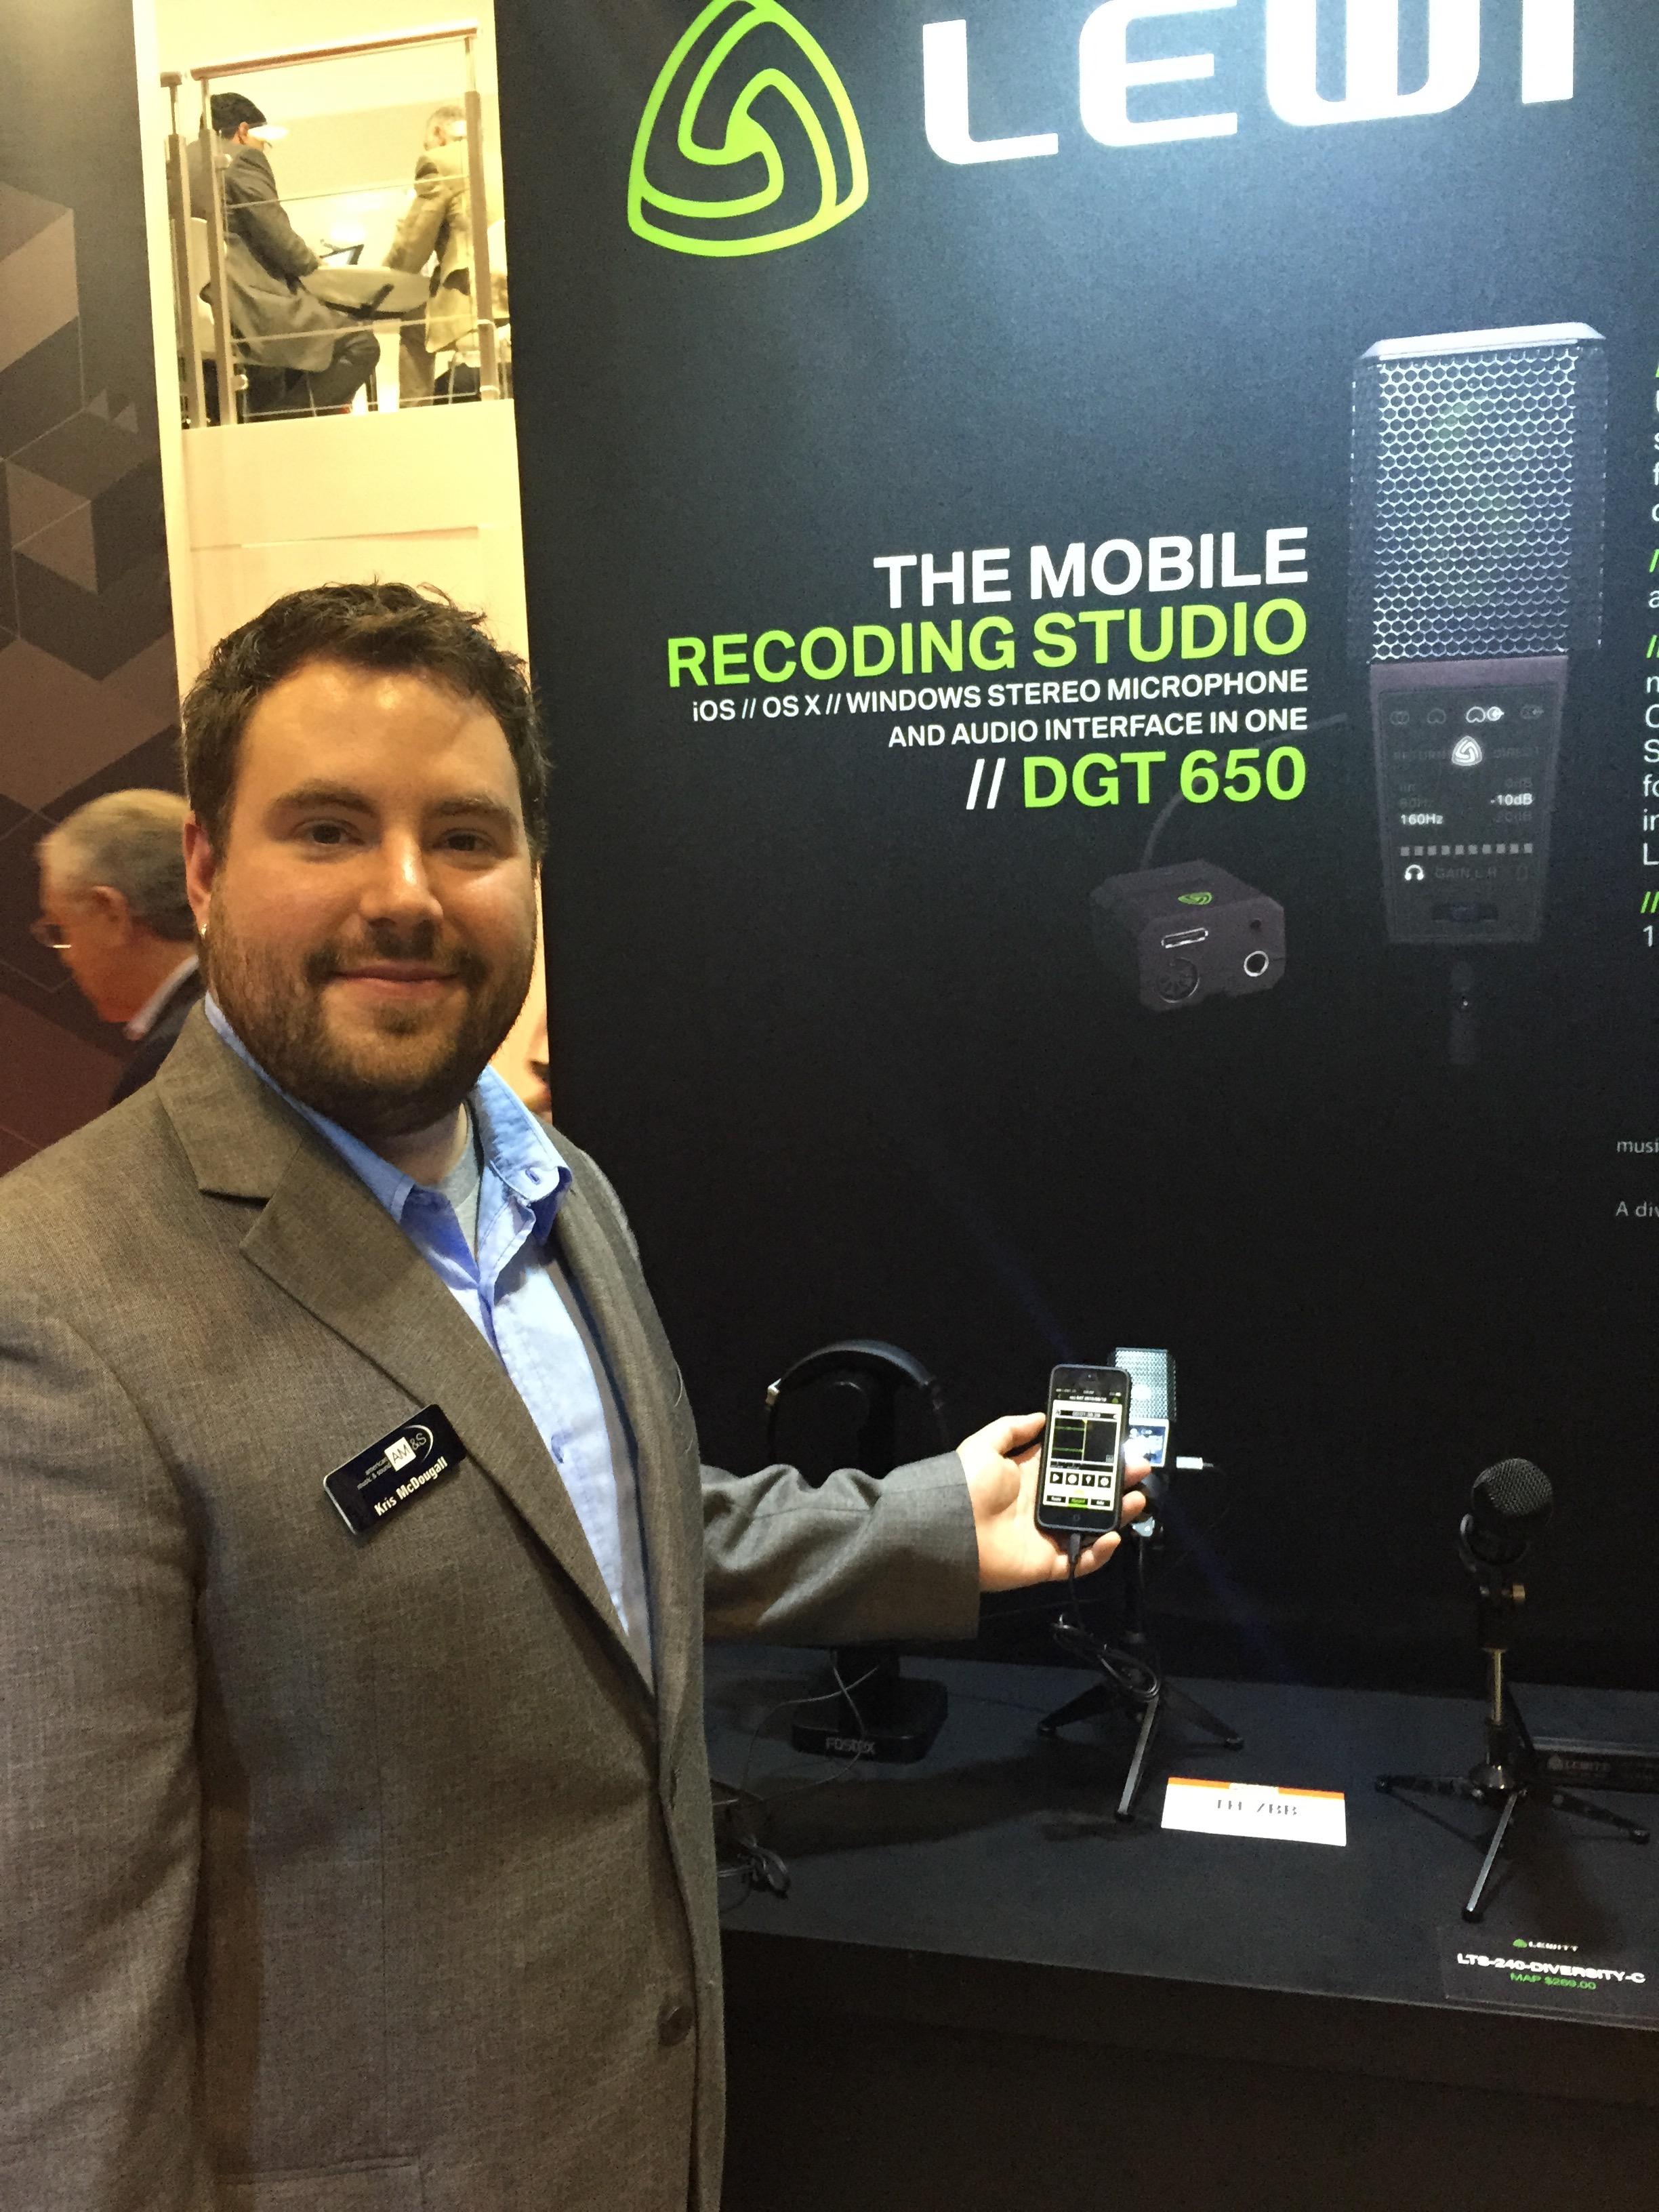 Kris McDougall at InfoComm 2015